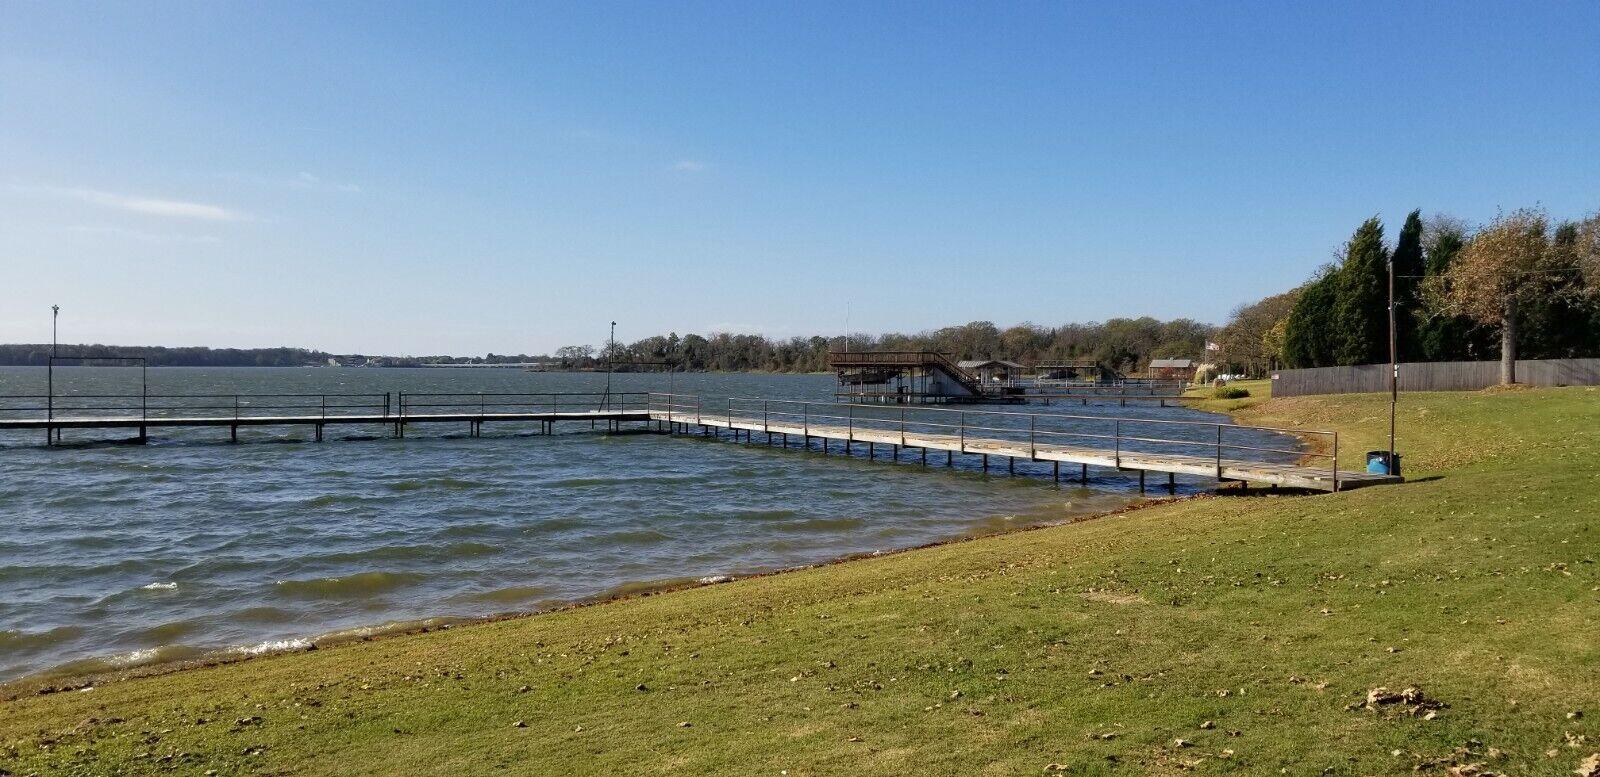 LAKE COMMUNITY LOT - TEXAS LAND FOR SALE - $61.00